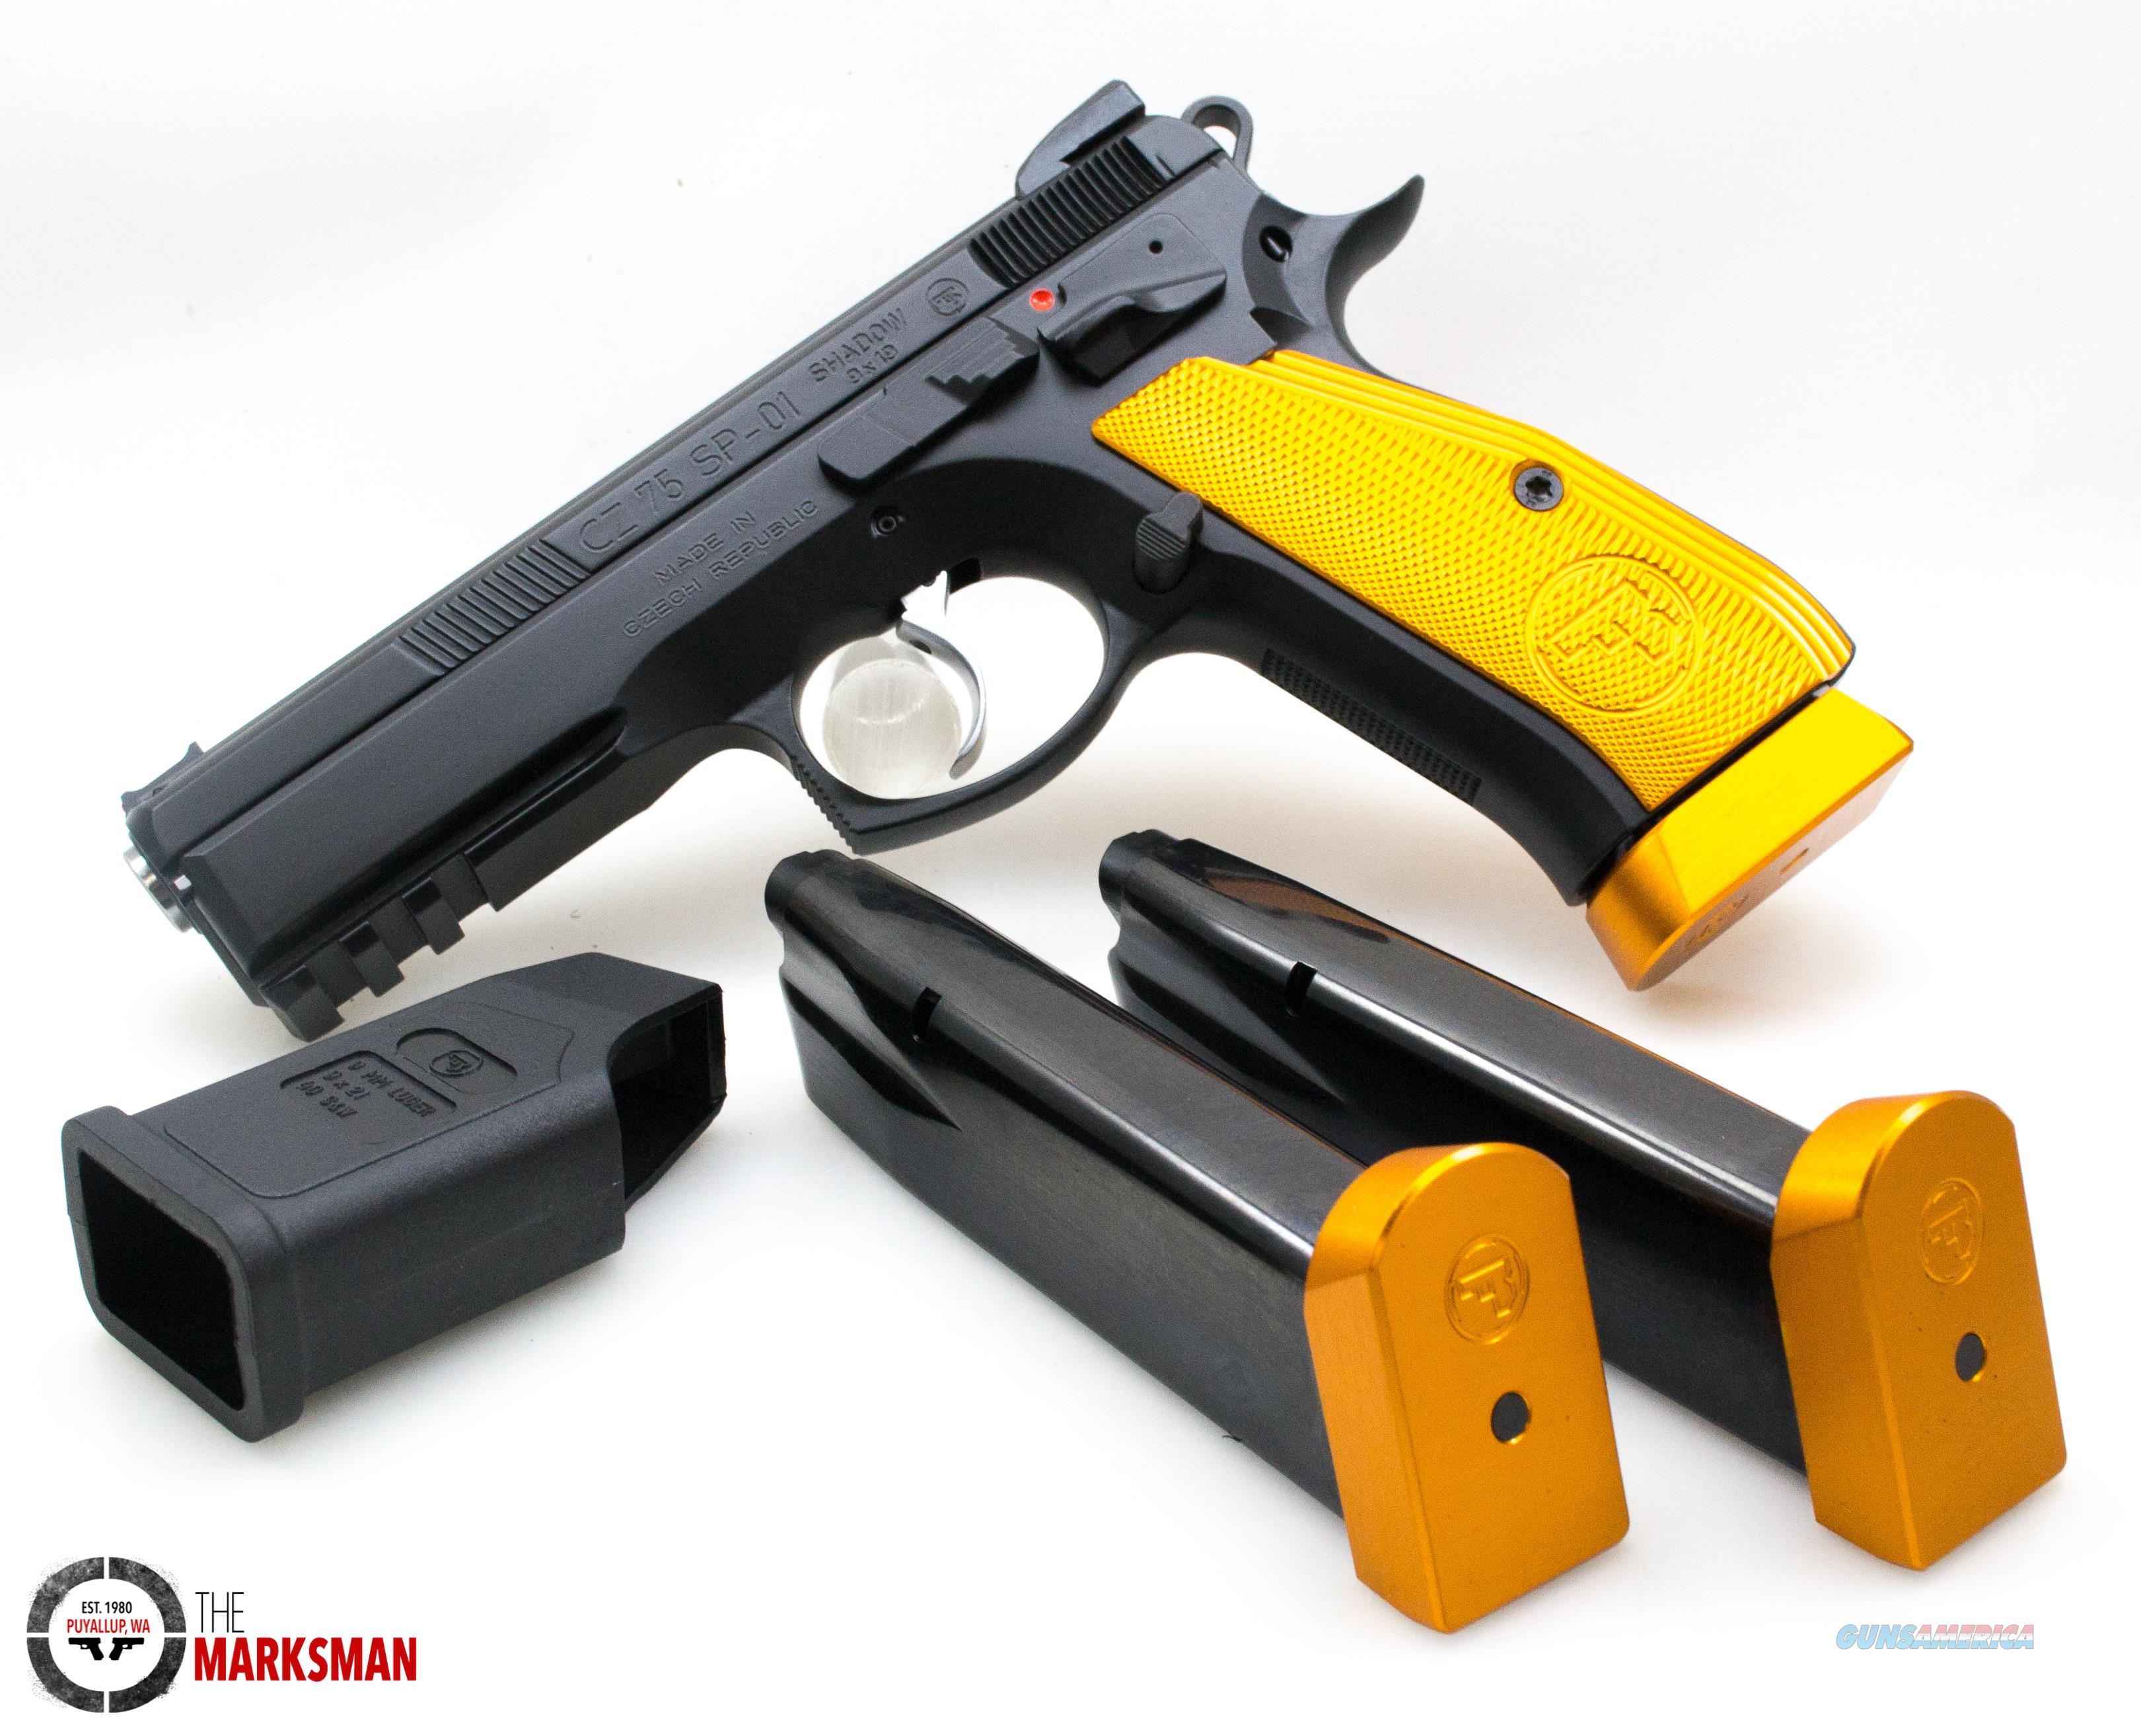 CZ SP-01 Shadow Orange, 9mm NEW Custom Shop Hand Fitted 91764  Guns > Pistols > CZ Pistols